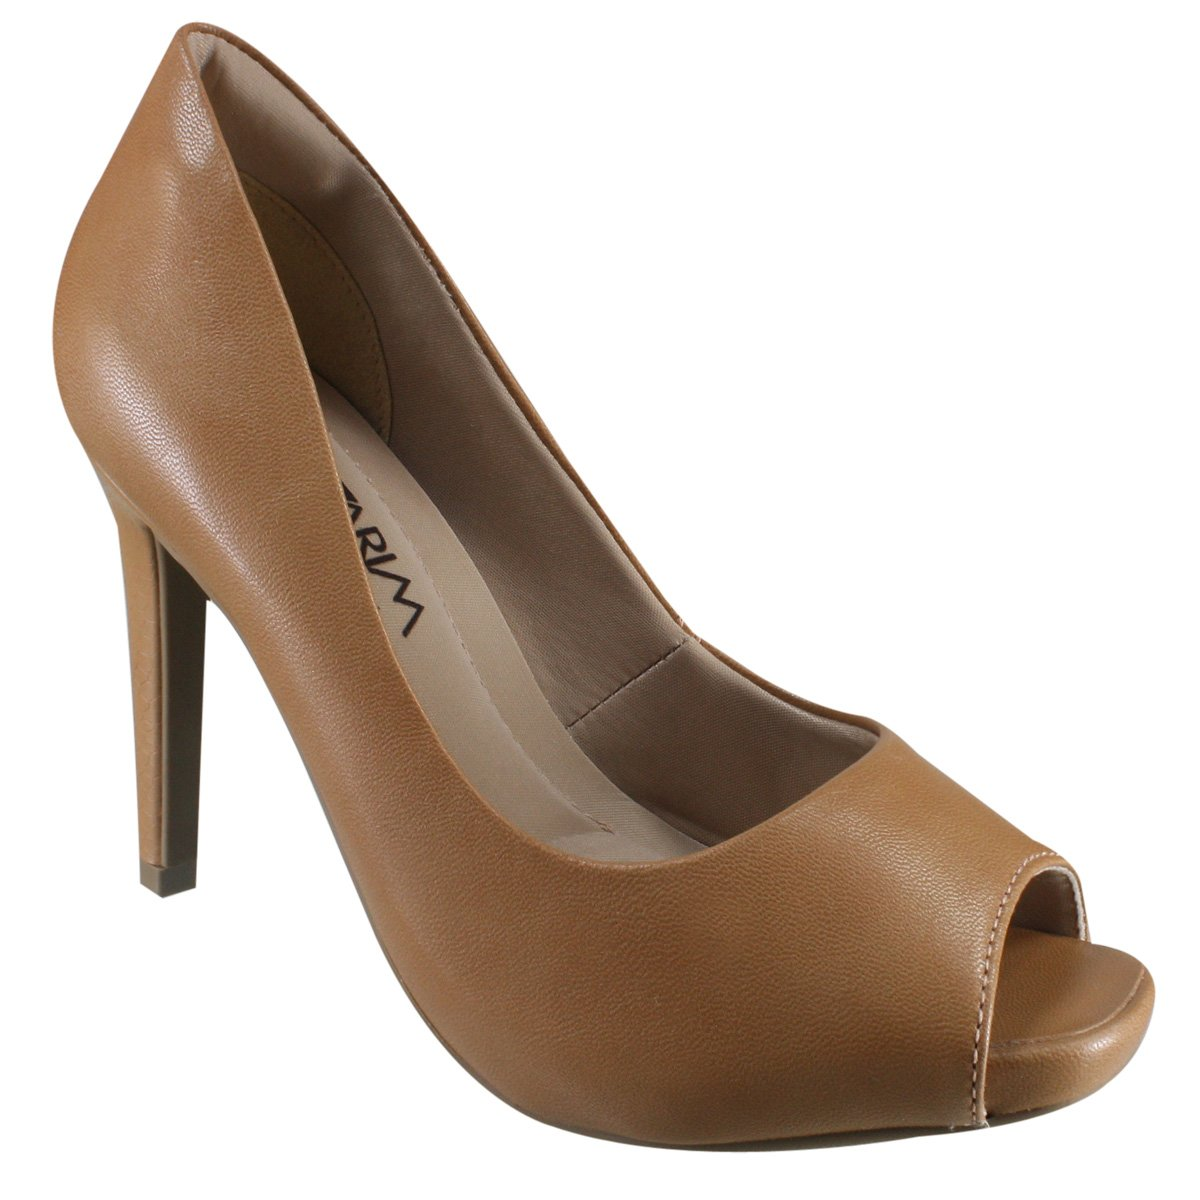 95ba9631ea Sapato Peep Toe Ramarim 17-47202 - Nut - Botas Online Femininas ...